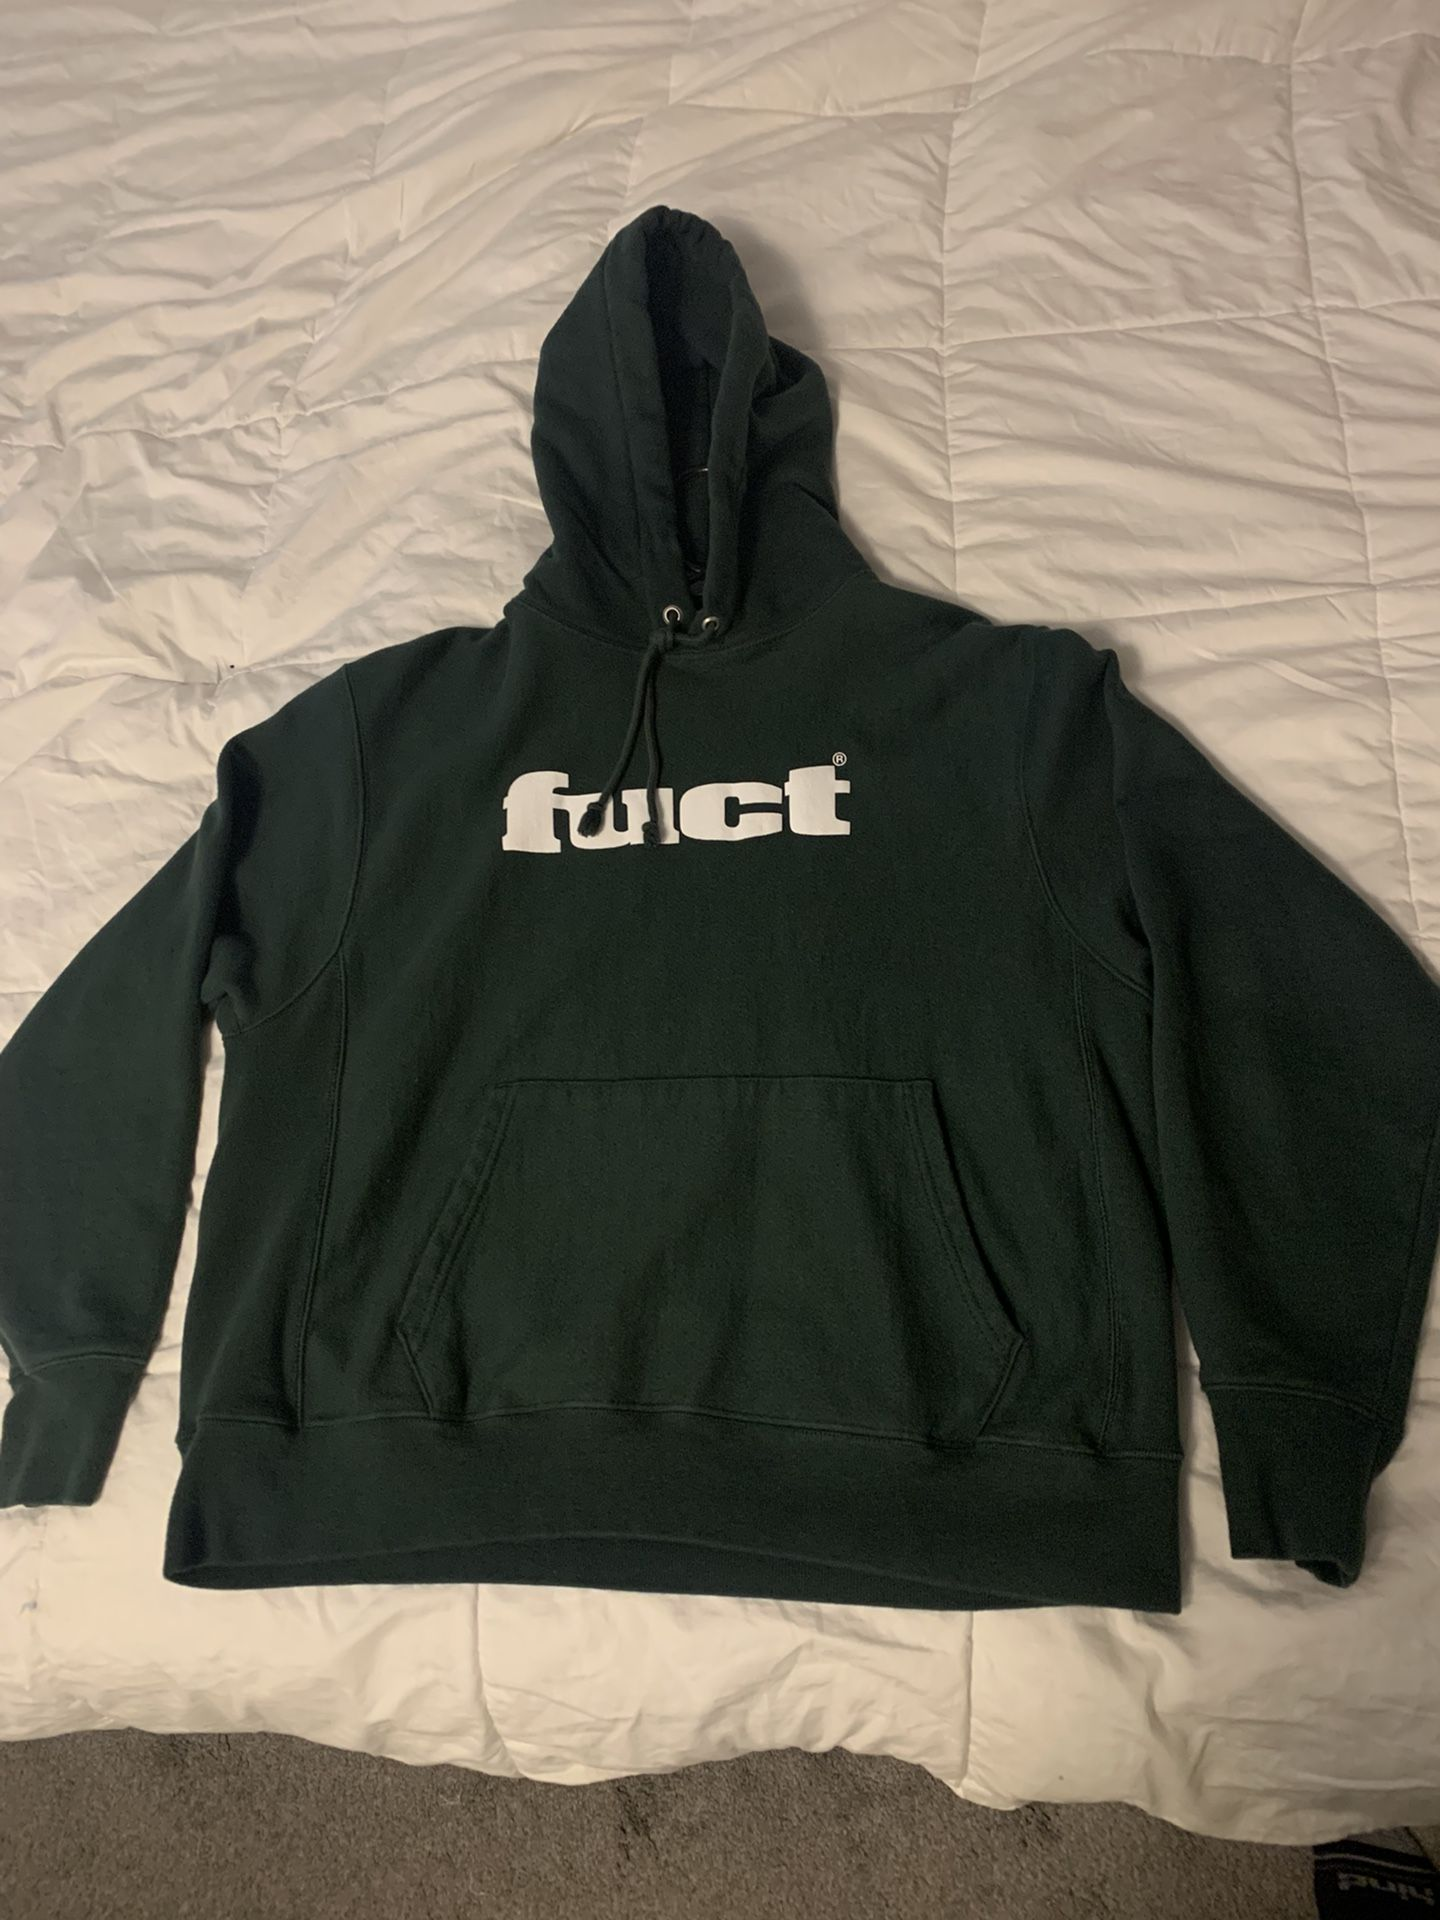 Fuct Og Logo Reverse Weave Hoodie